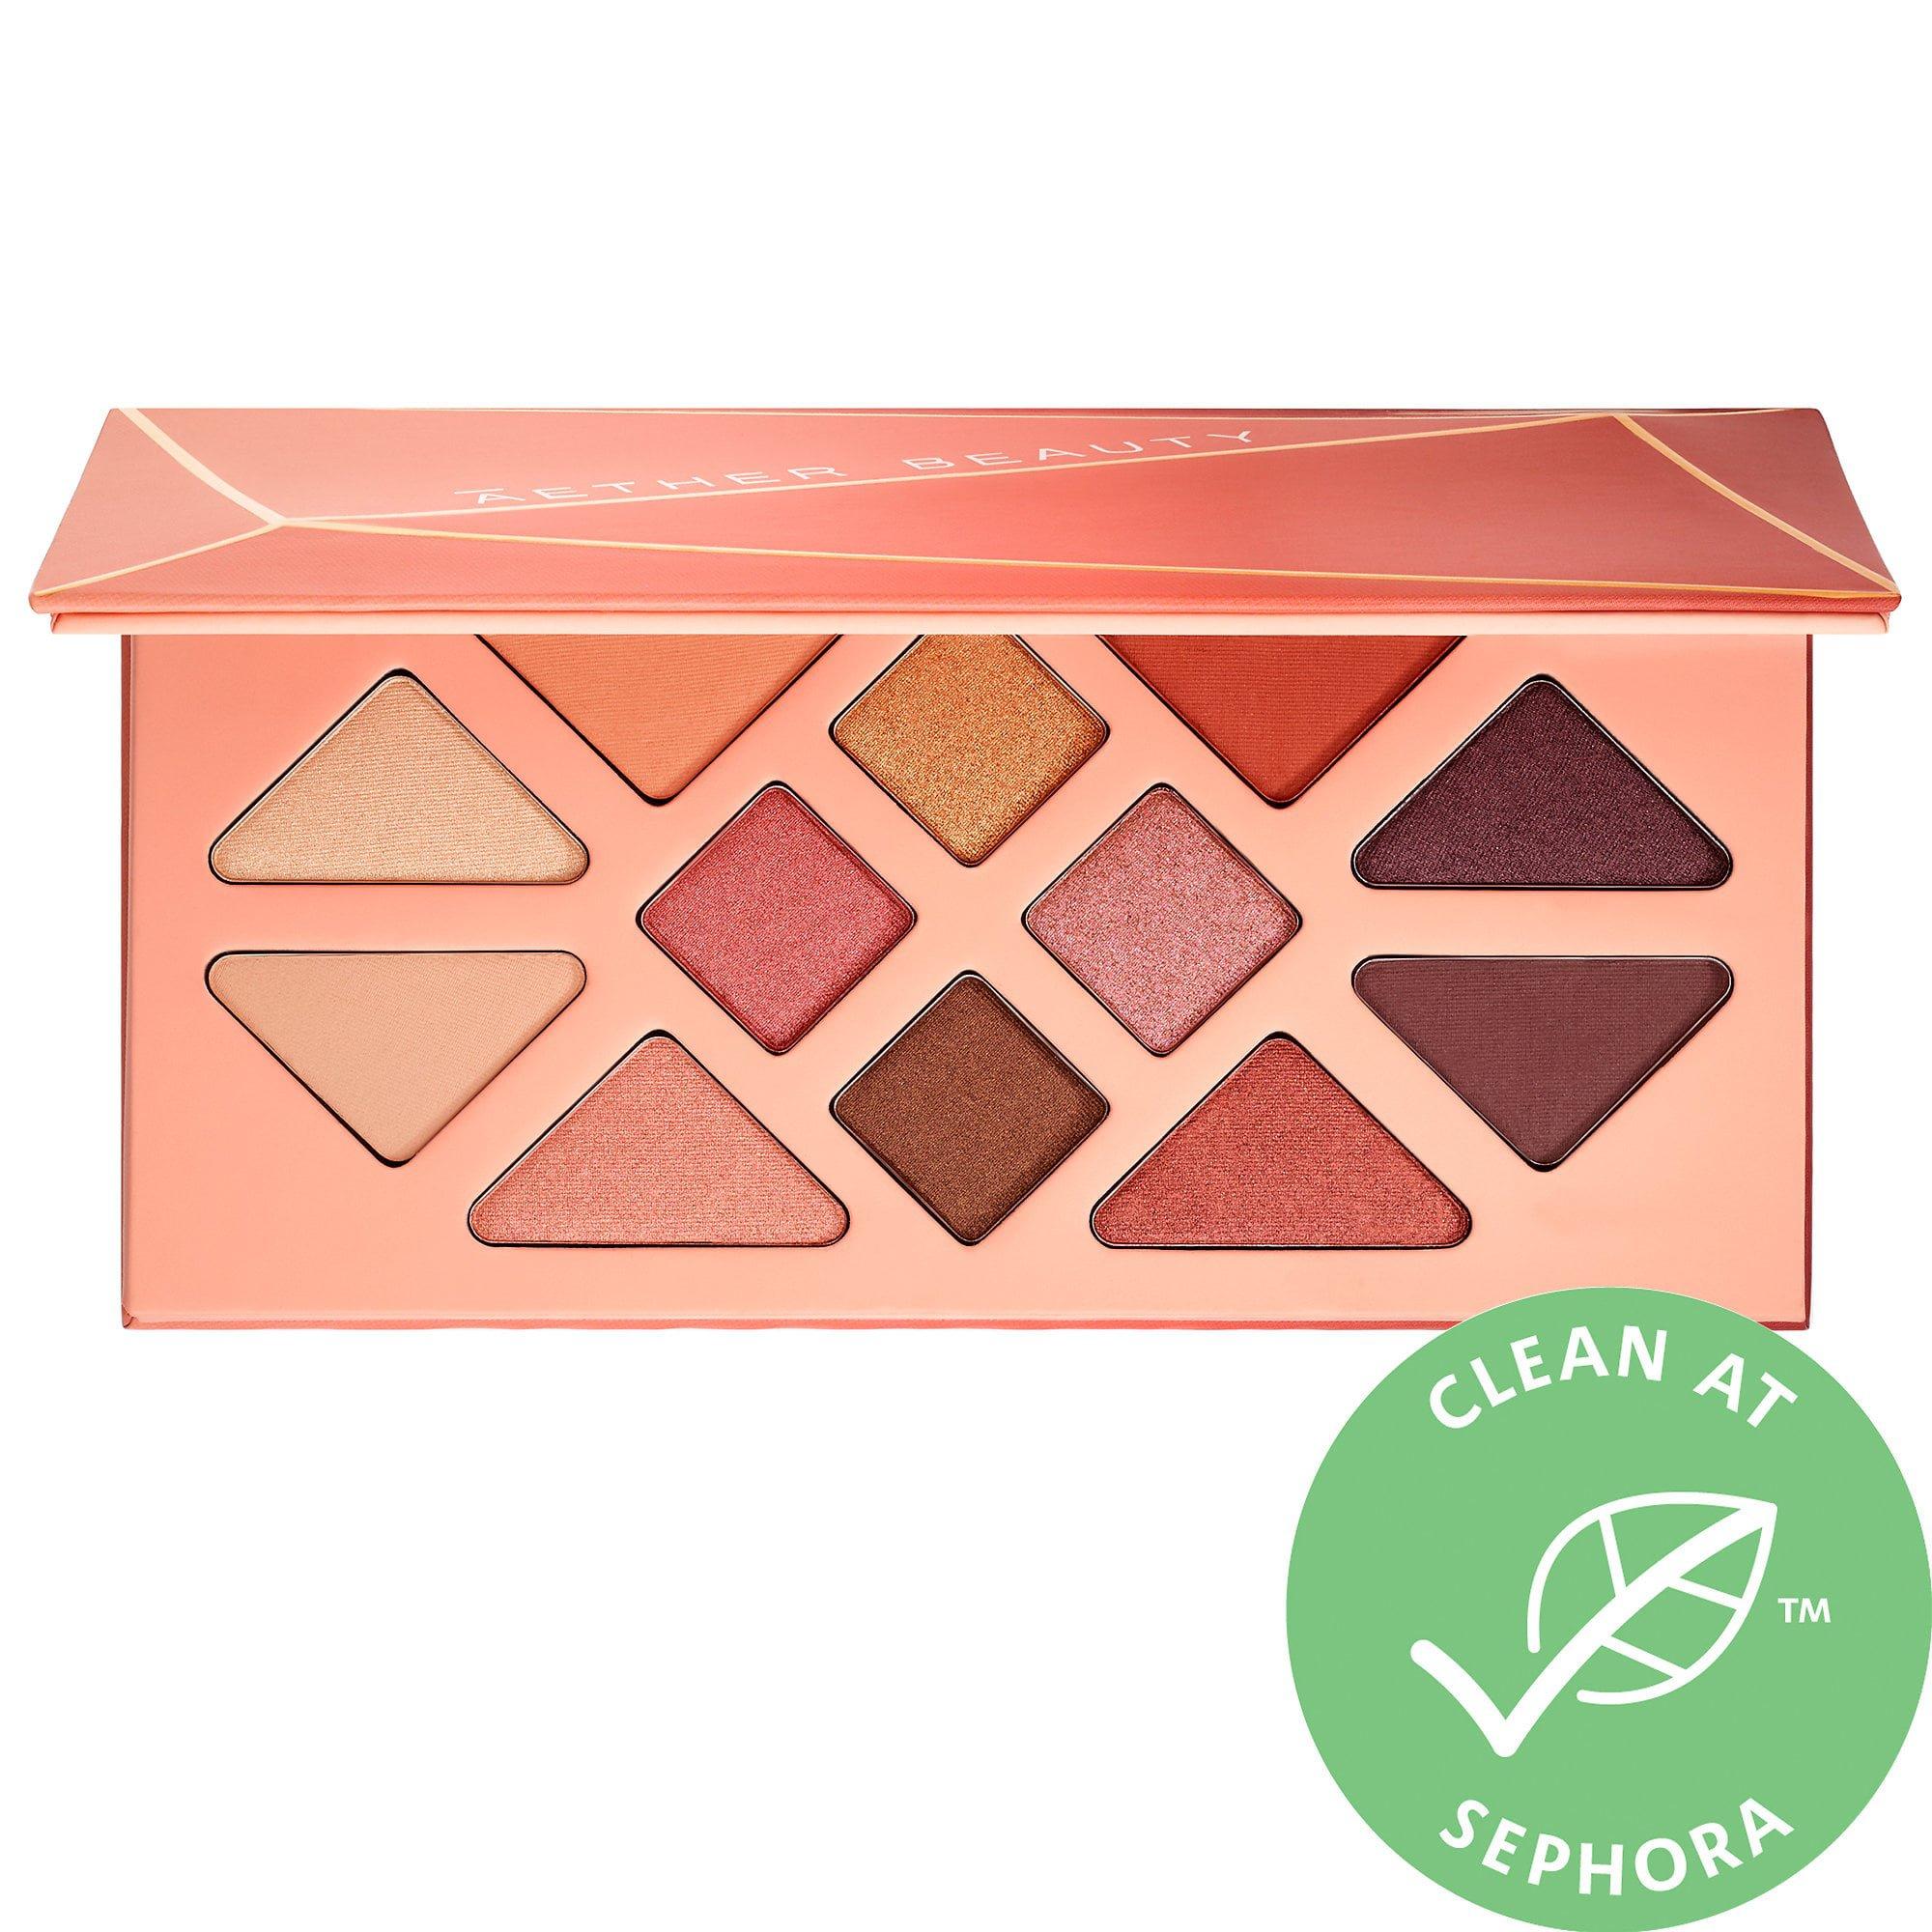 Summer Solstice Eyeshadow Palette - Aether Beauty   Sephora